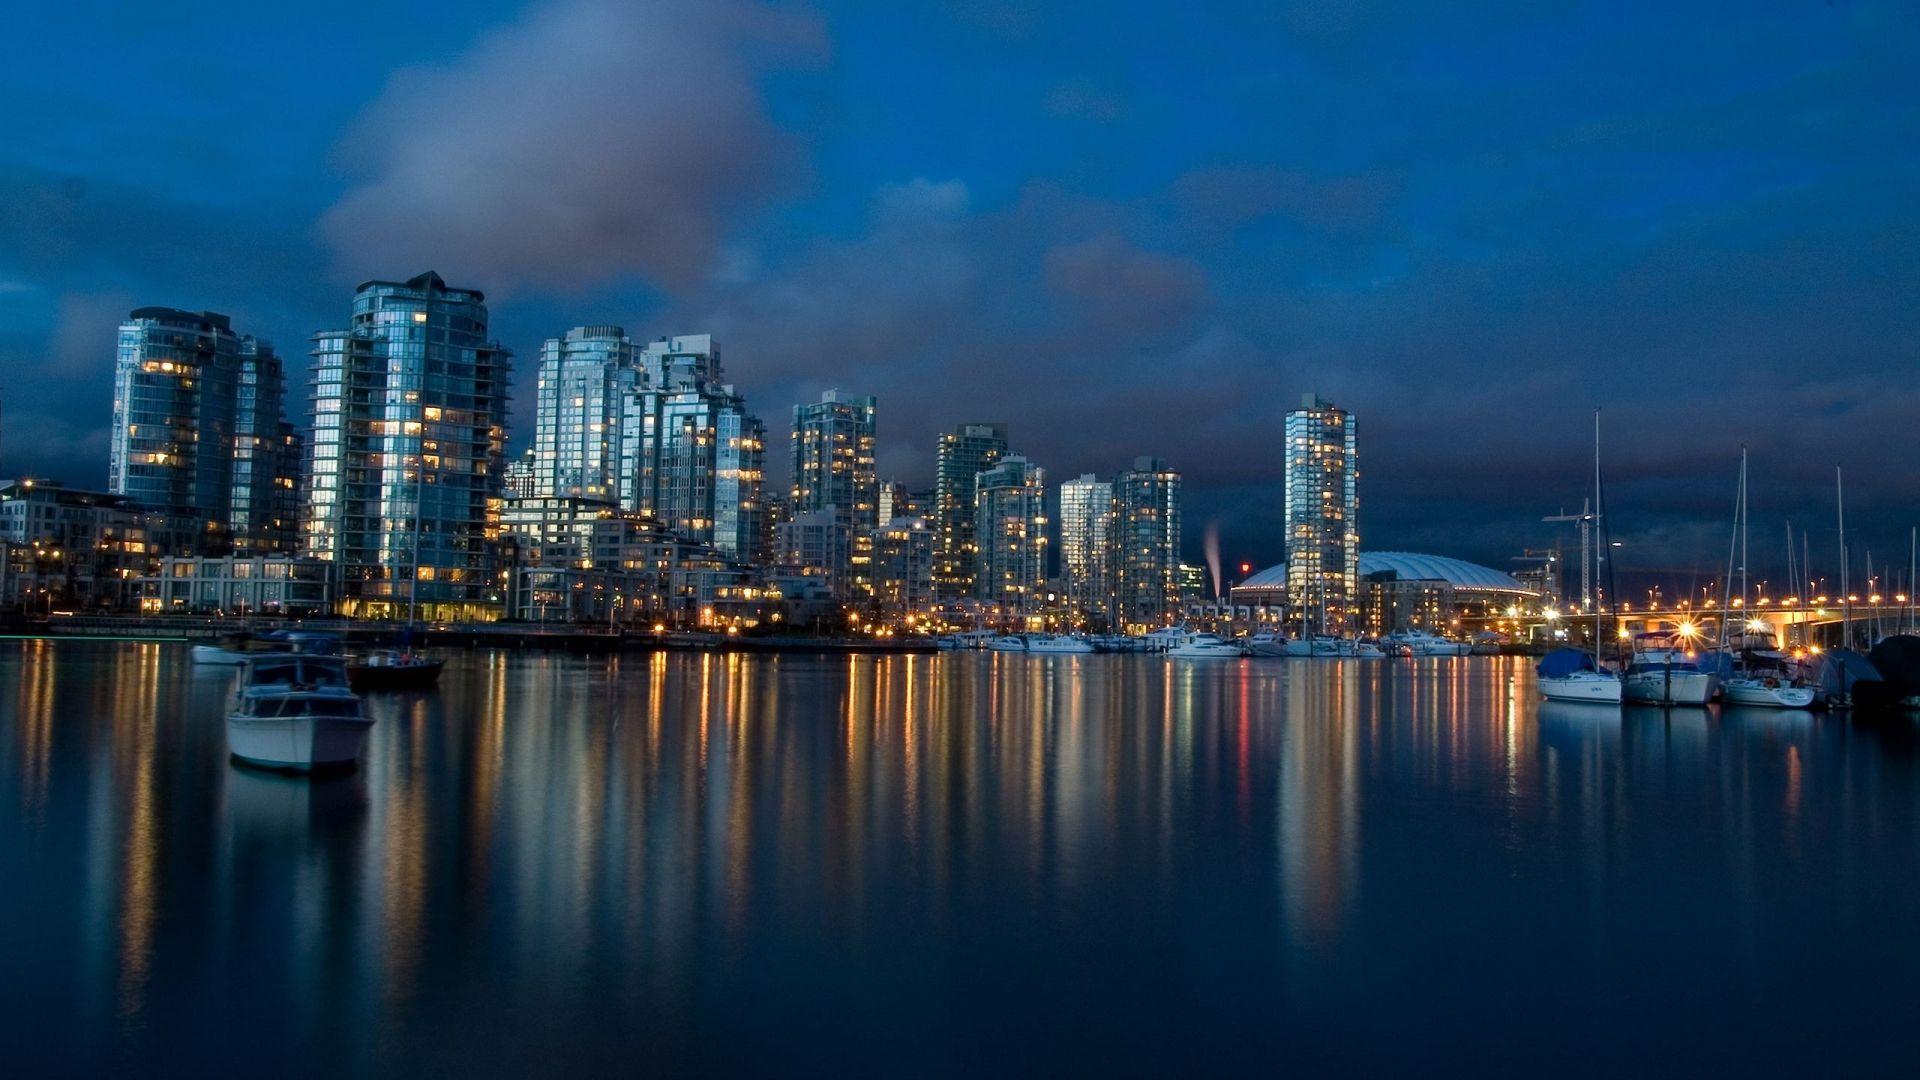 Alquiler de yates en Panamá. Alquiler de barcos baratos en Panamá